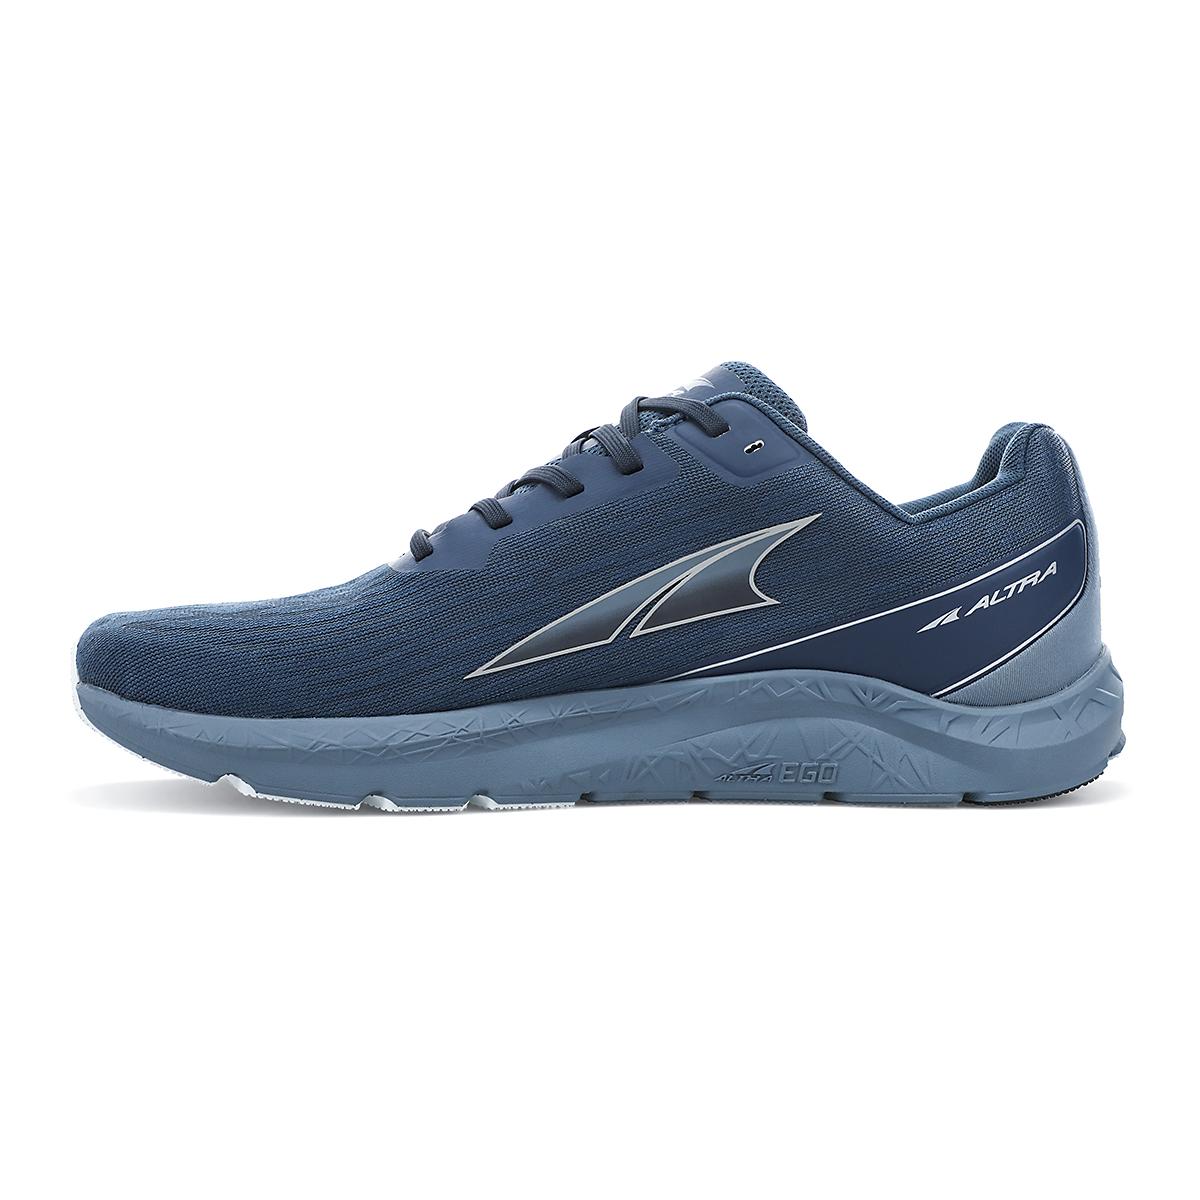 Men's Altra Rivera Running Shoe - Color: Majolica Blue - Size: 7 - Width: Regular, Majolica Blue, large, image 2